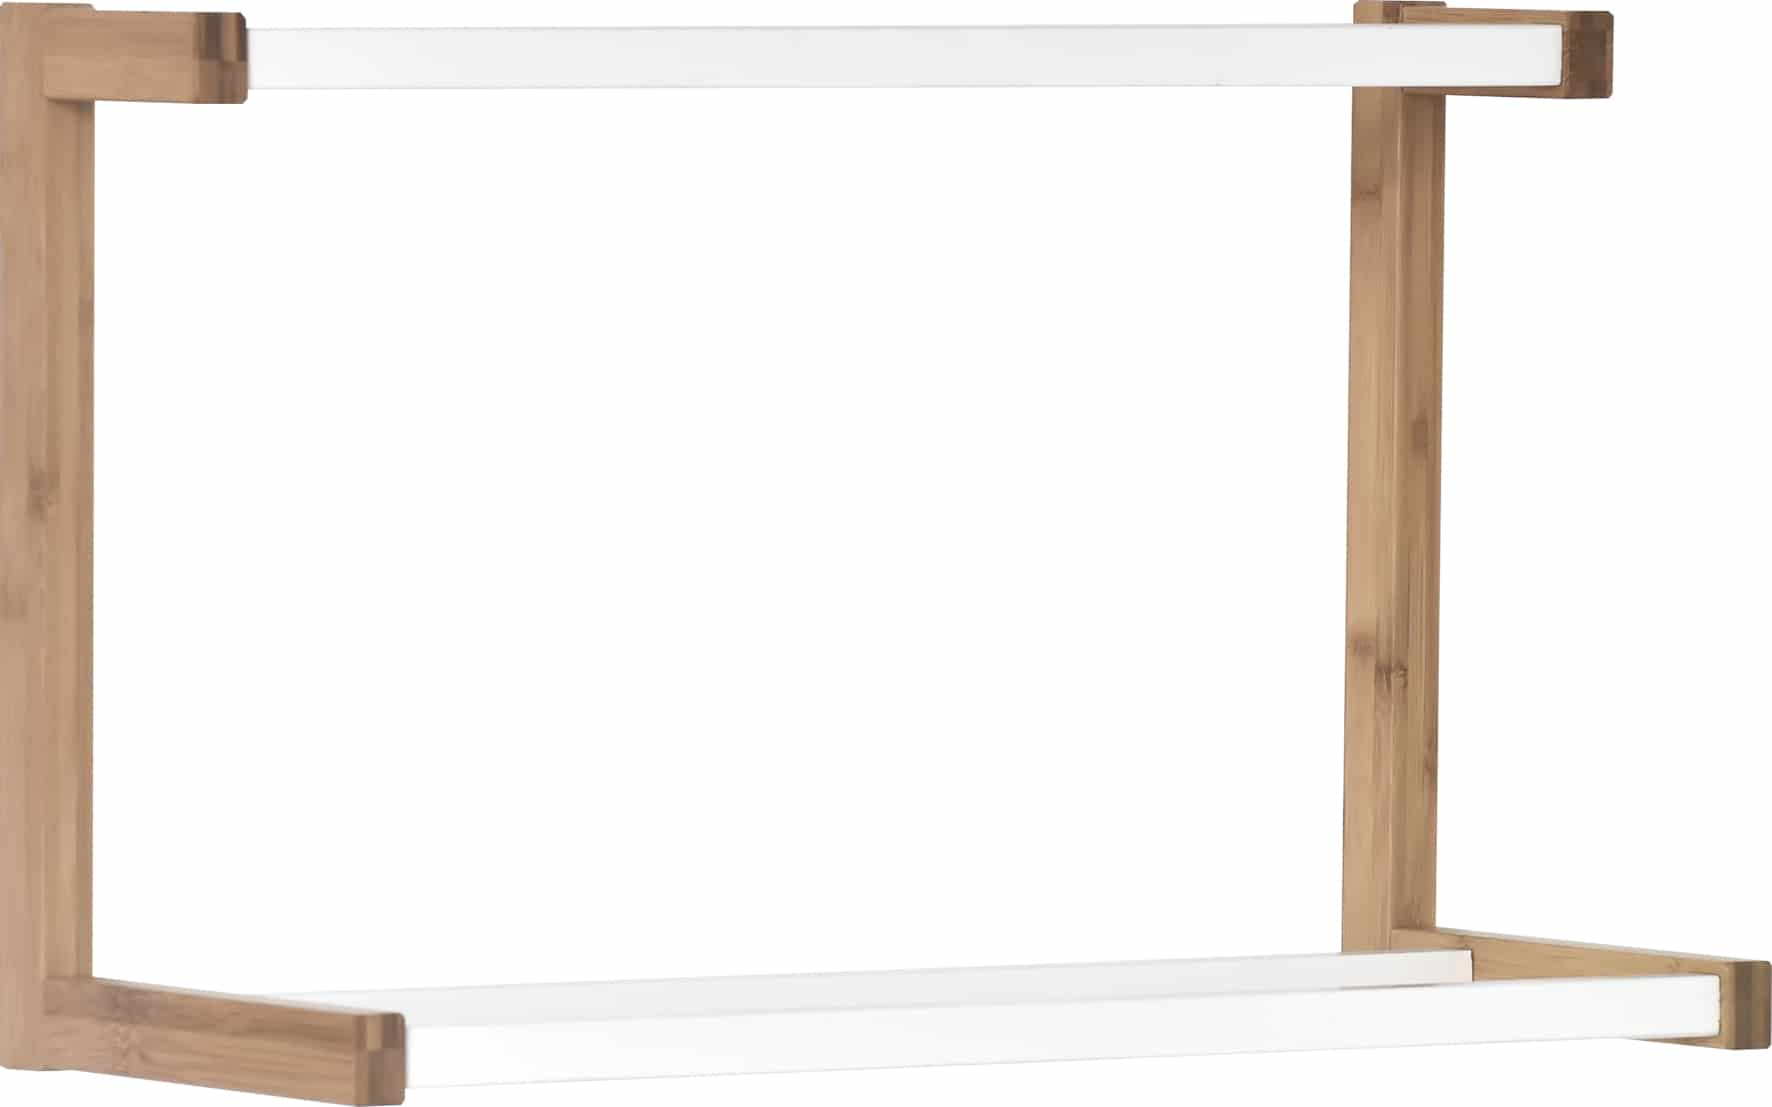 4goodz Bamboe/MDF Handdoek Wandrek 3 beugels 23x55x35 cm - Bruin/Wit